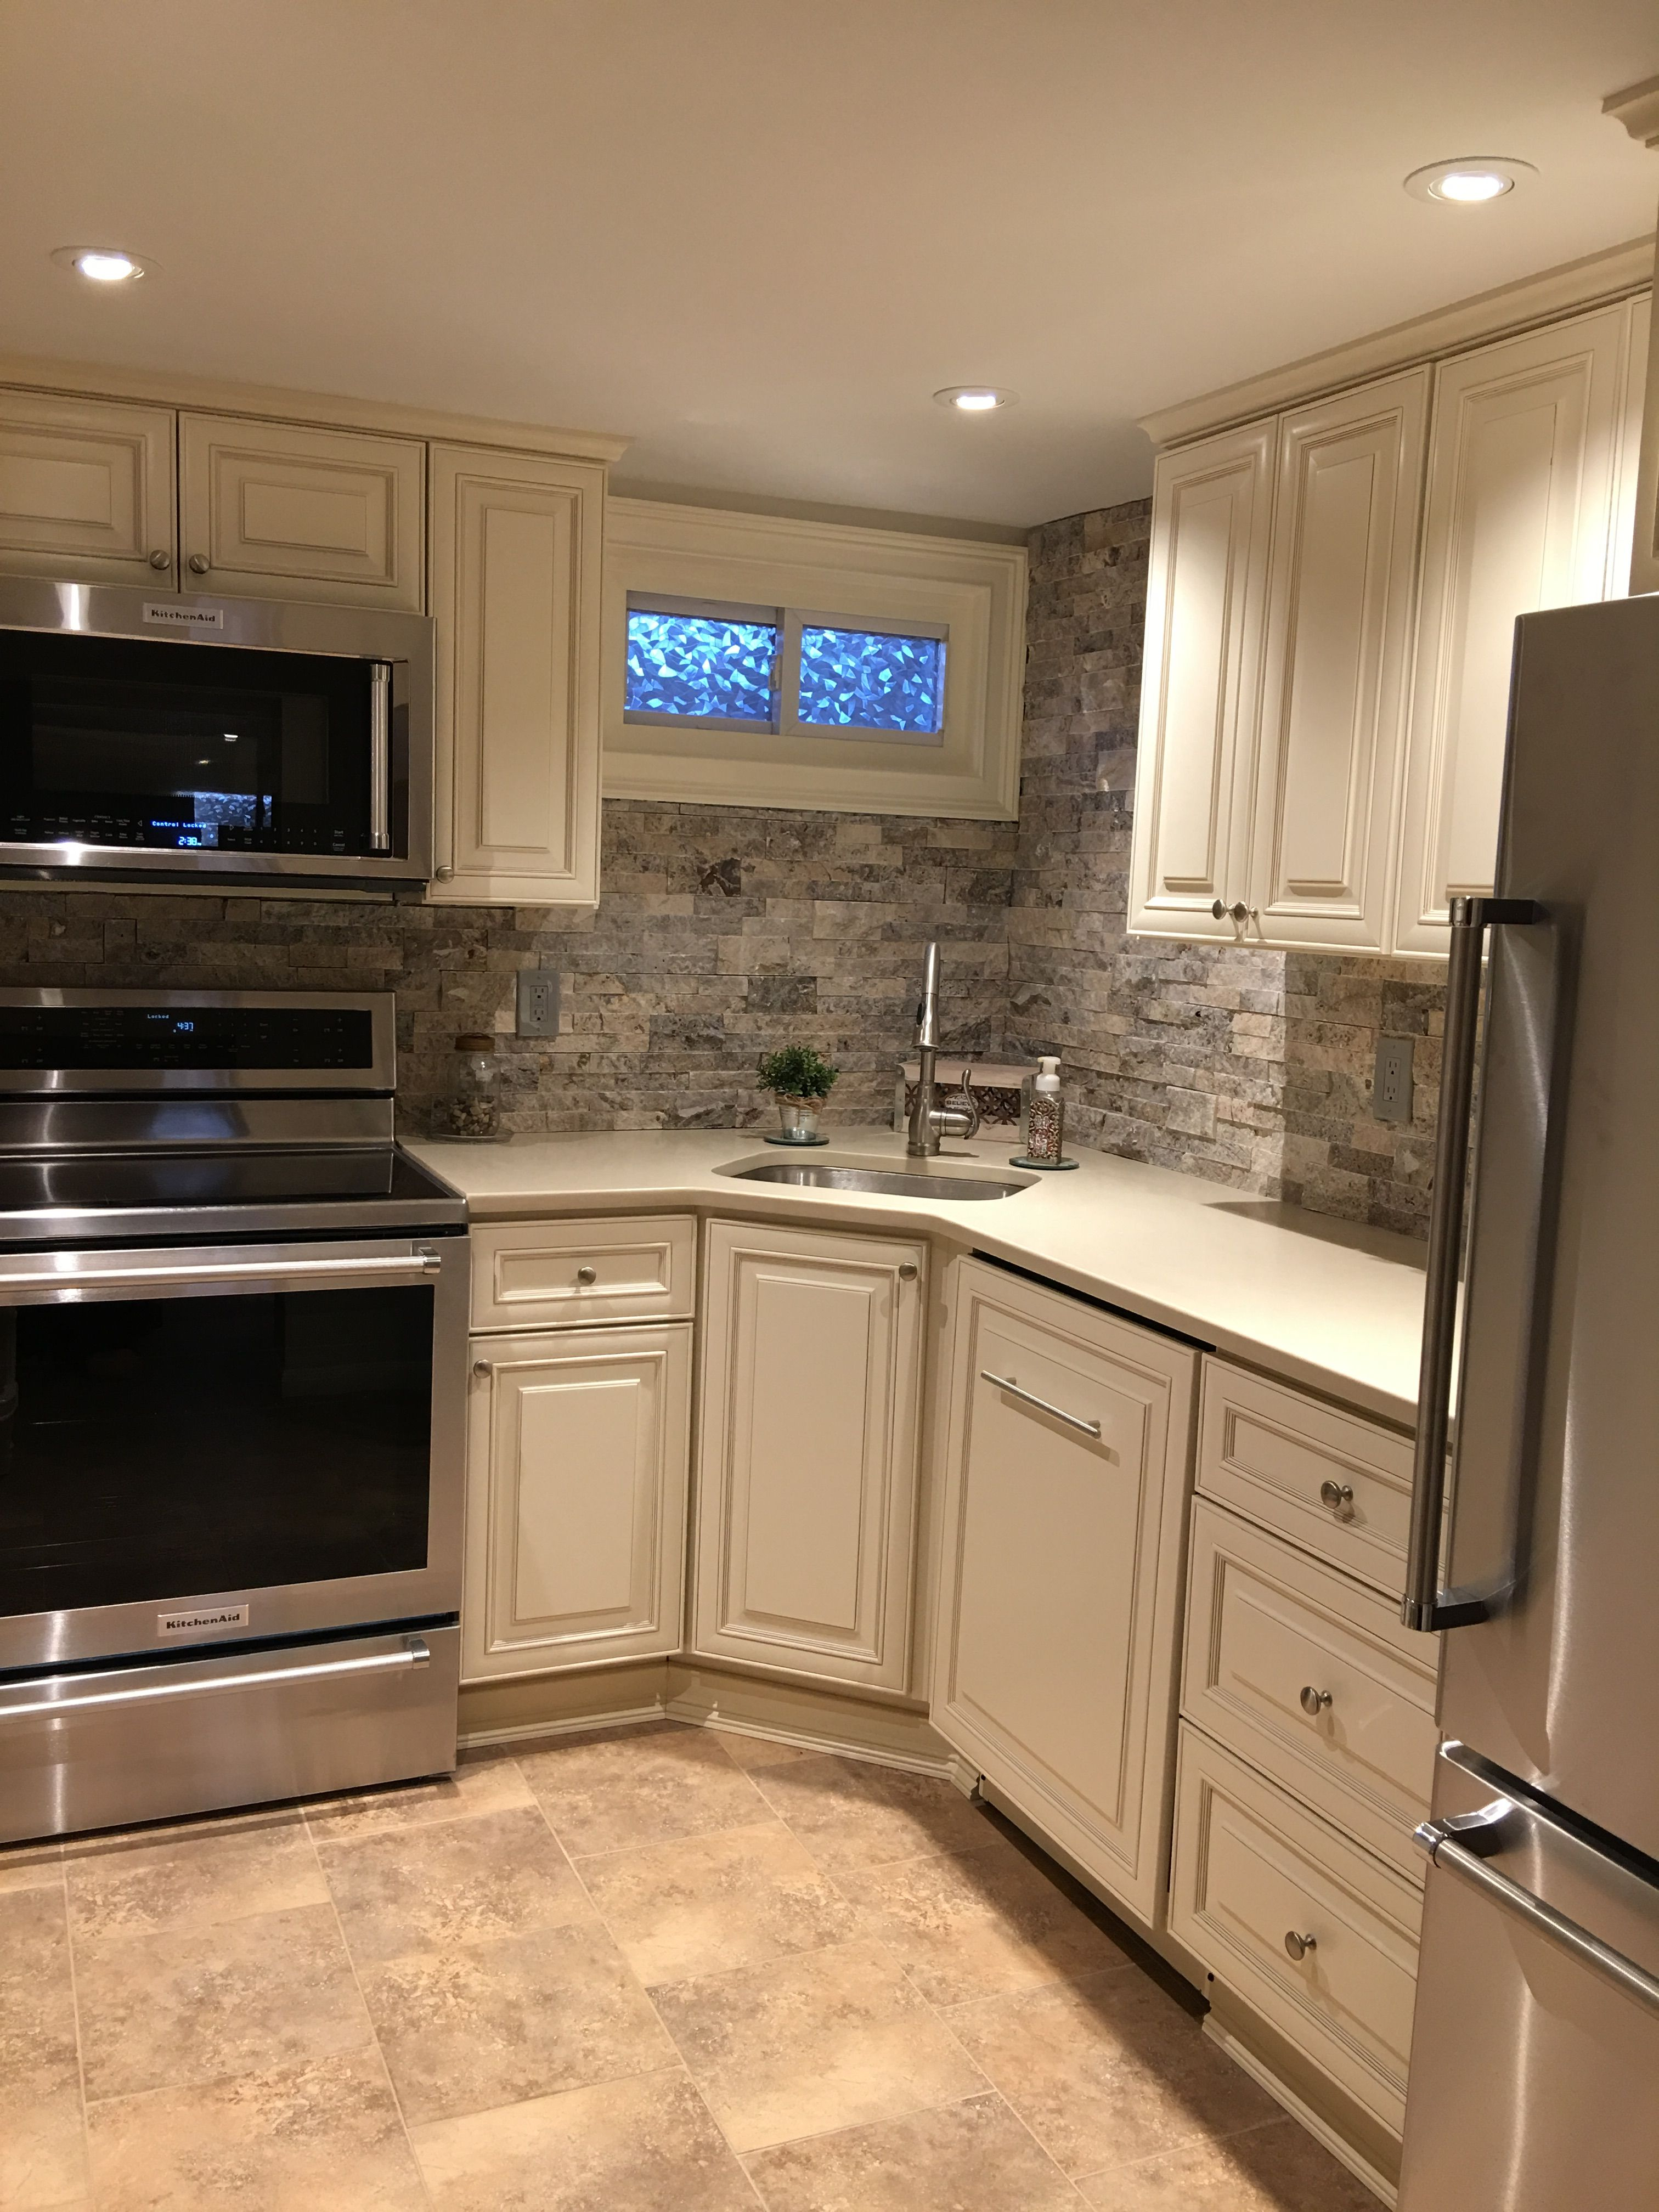 Apt Kitchen Renovations: Pin By Deborah Starr On Renovation In 2019